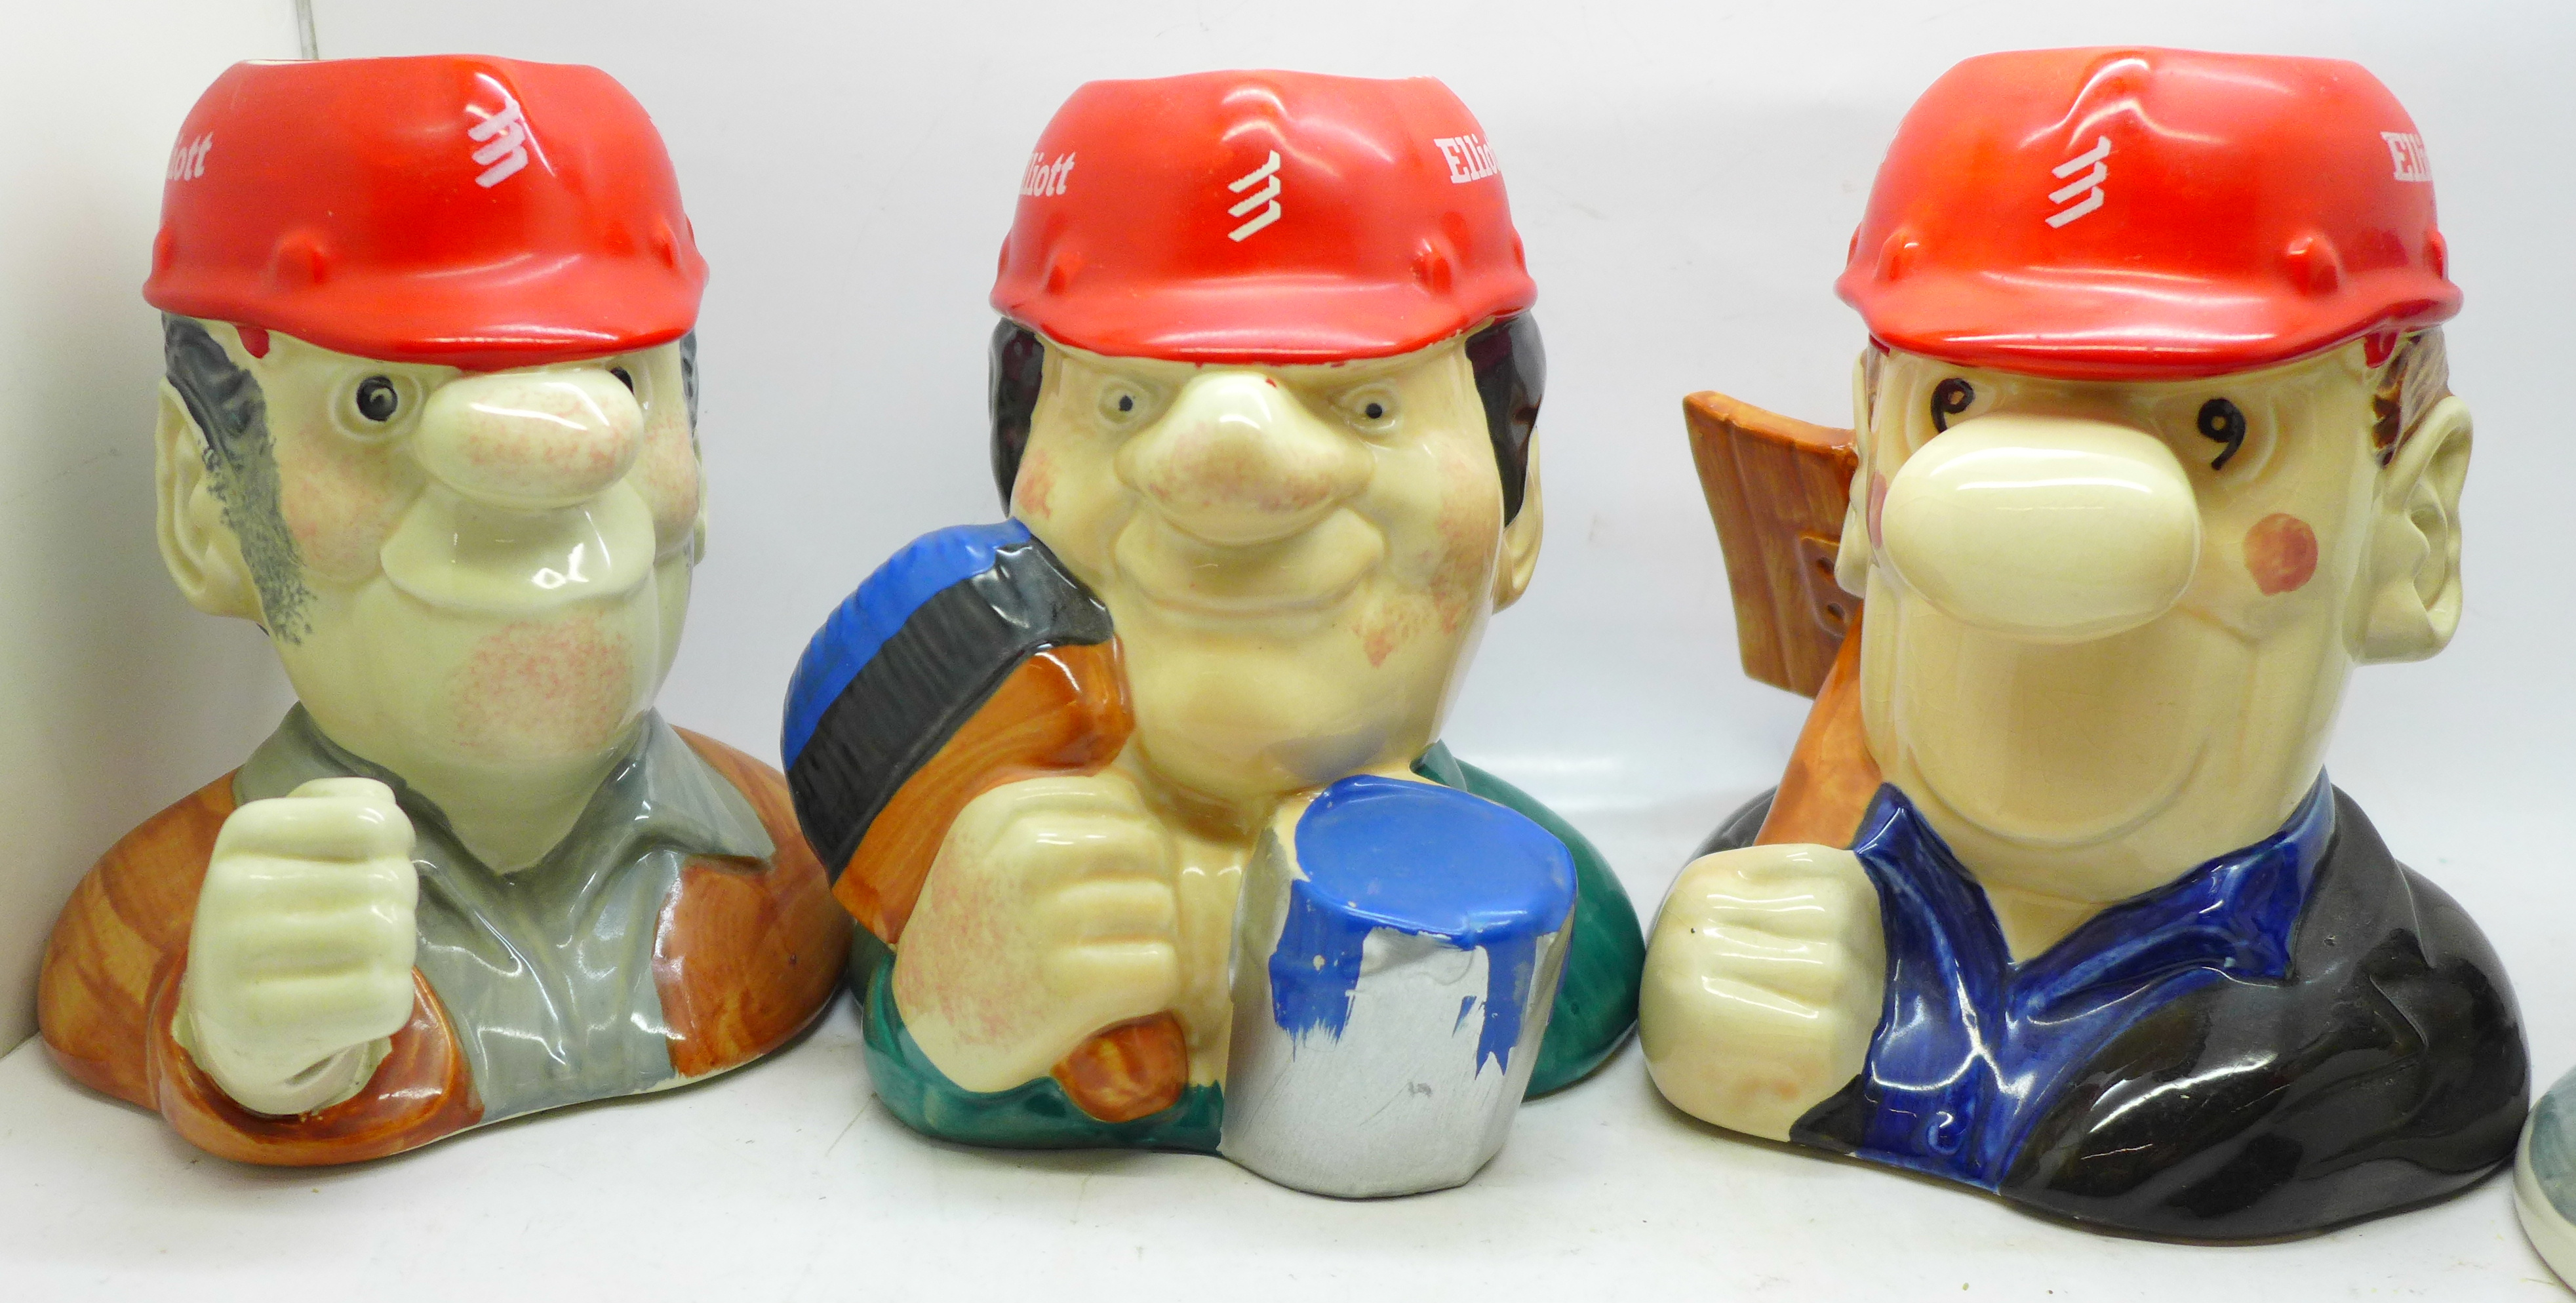 Four Elliott Toby jugs, 'The Builders' - Image 2 of 6